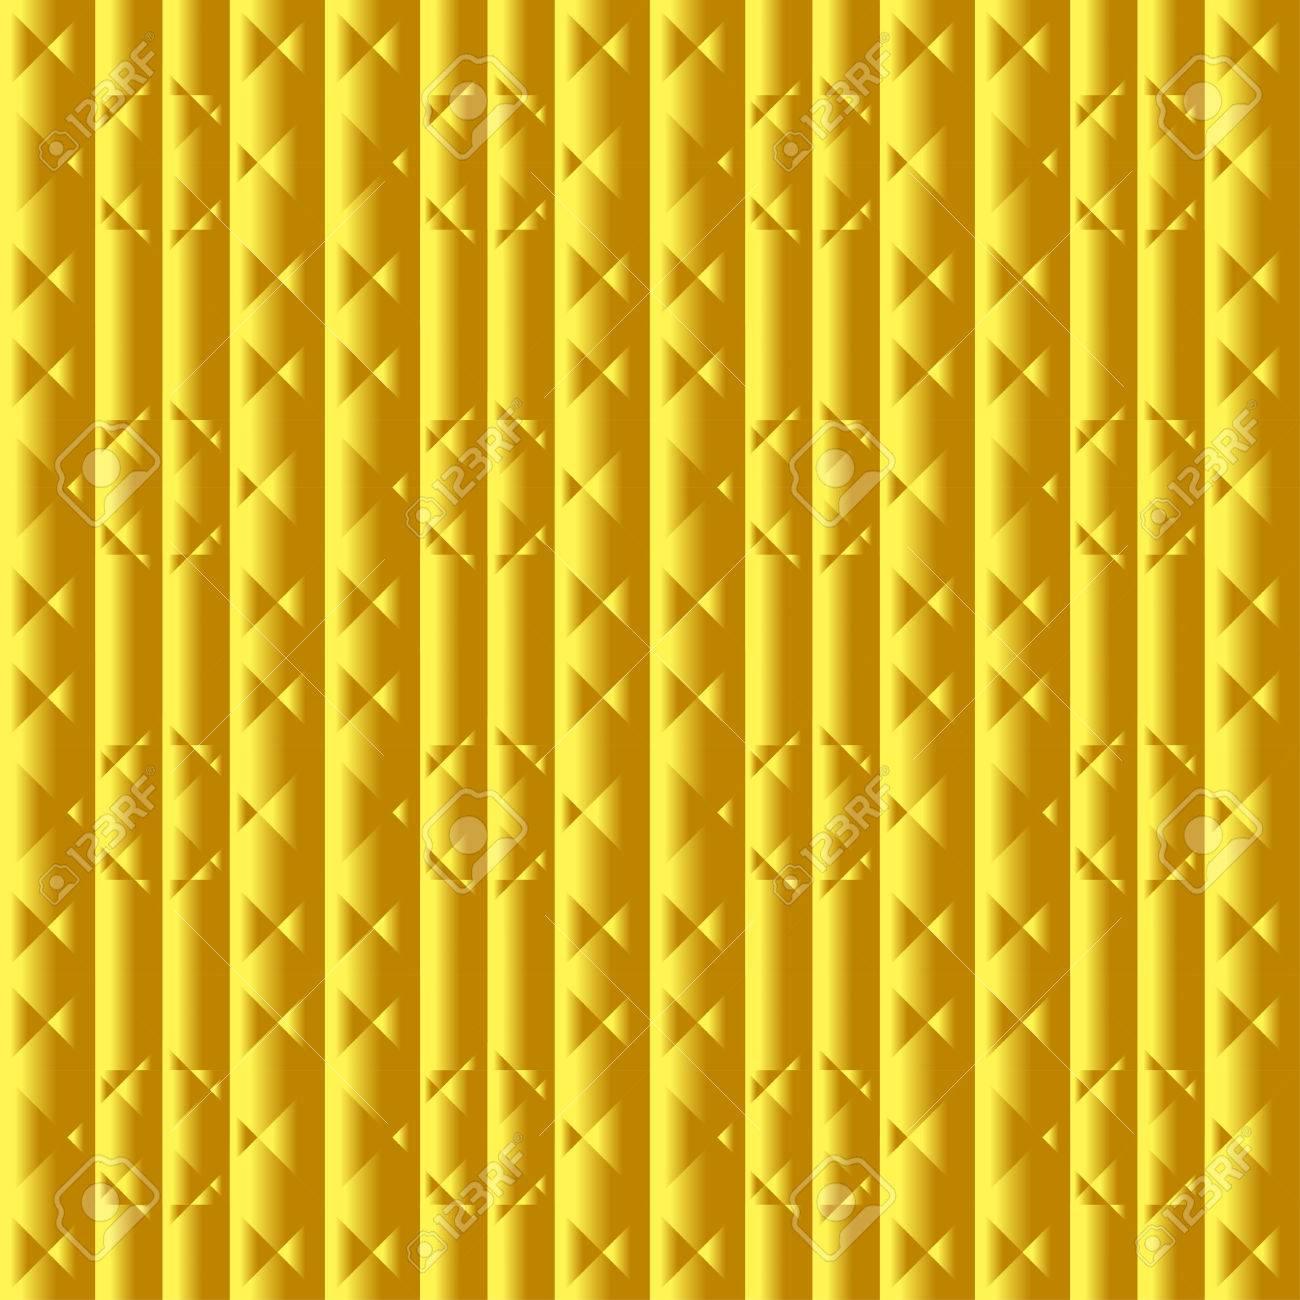 Gold Color Texture